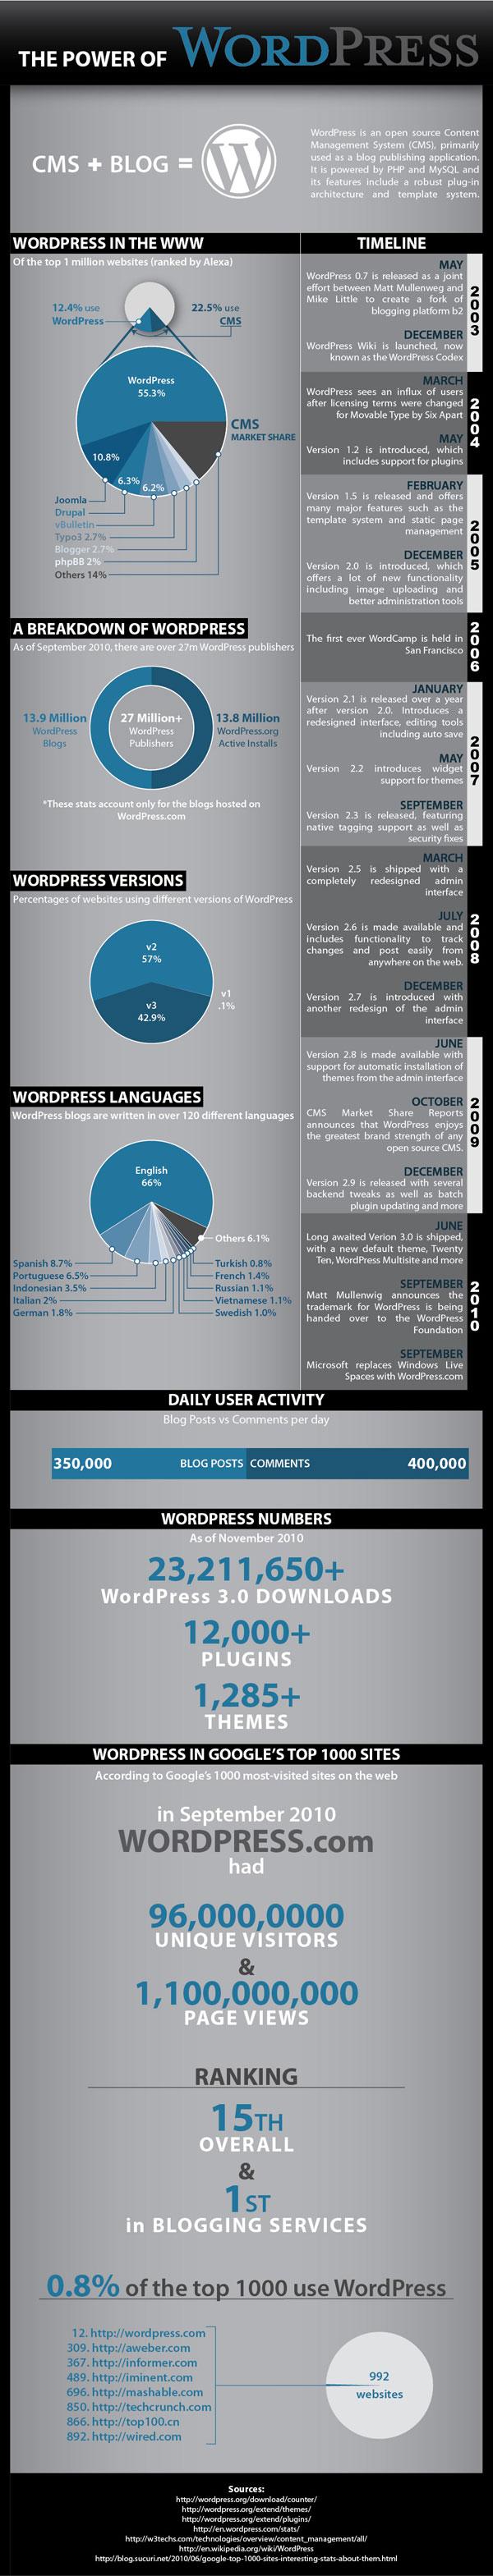 Infographic: The Power of WordPress